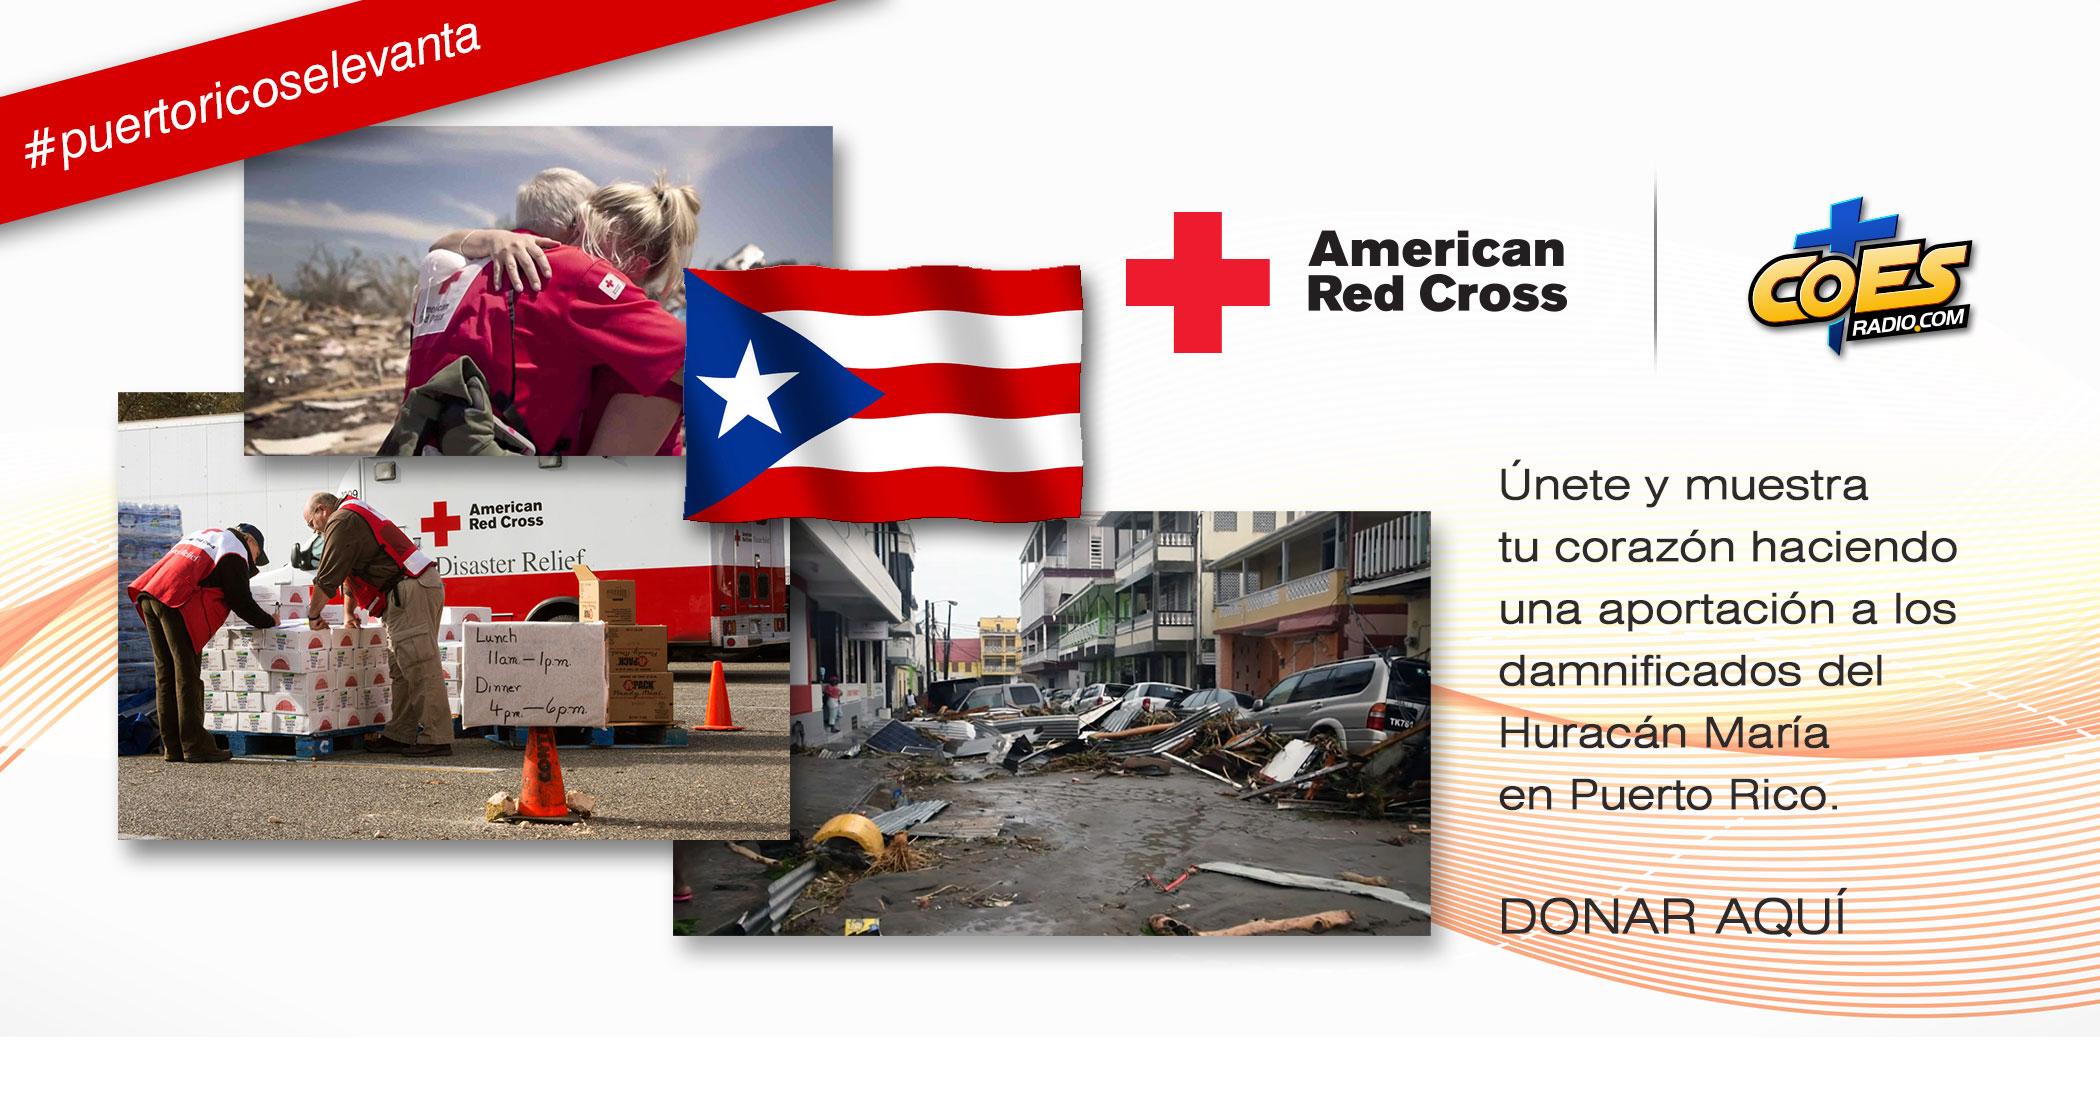 Huracán María - American Red Cross